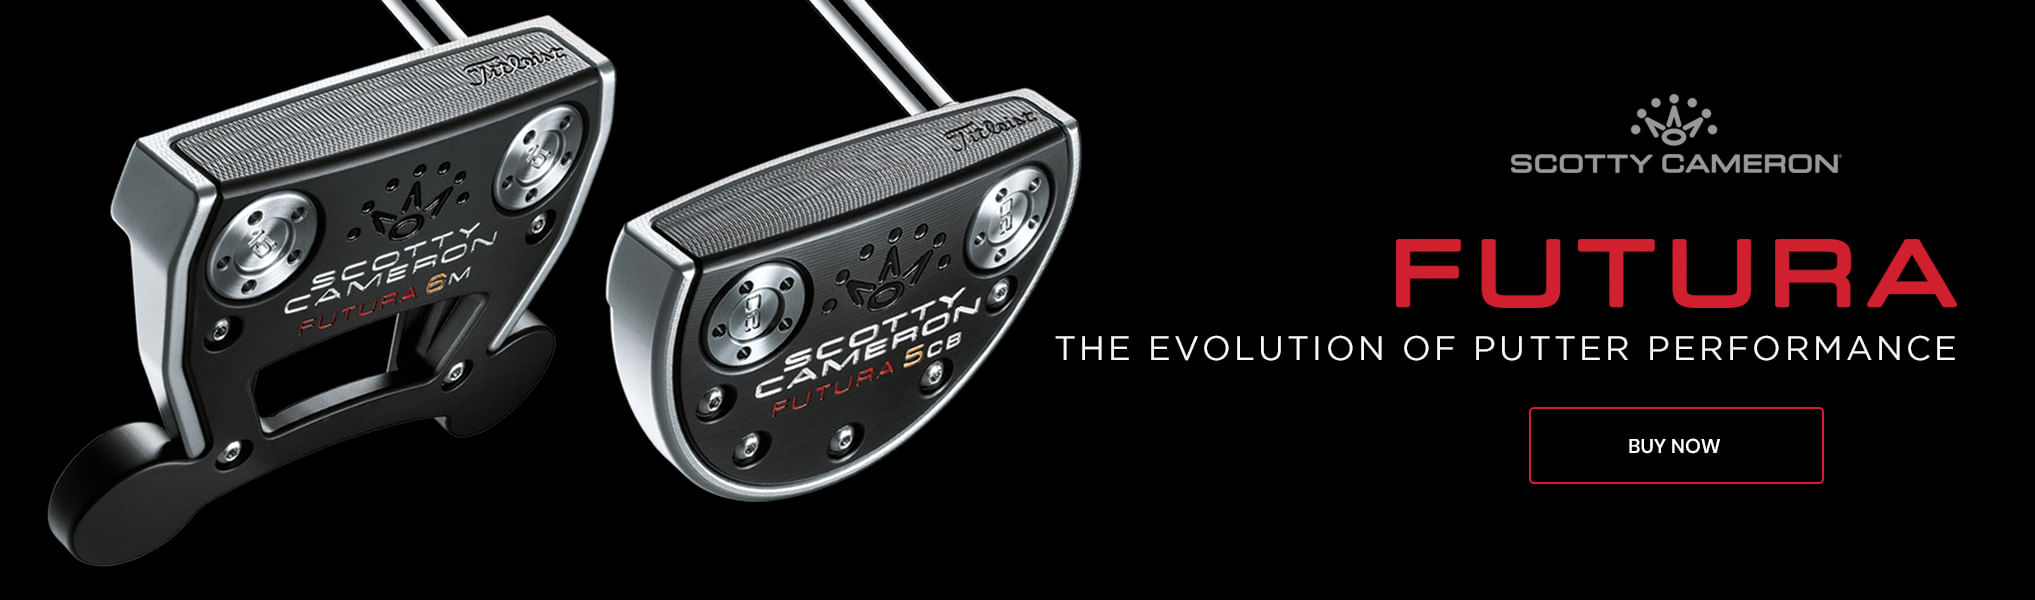 Scotty Cameron Futura golf putters